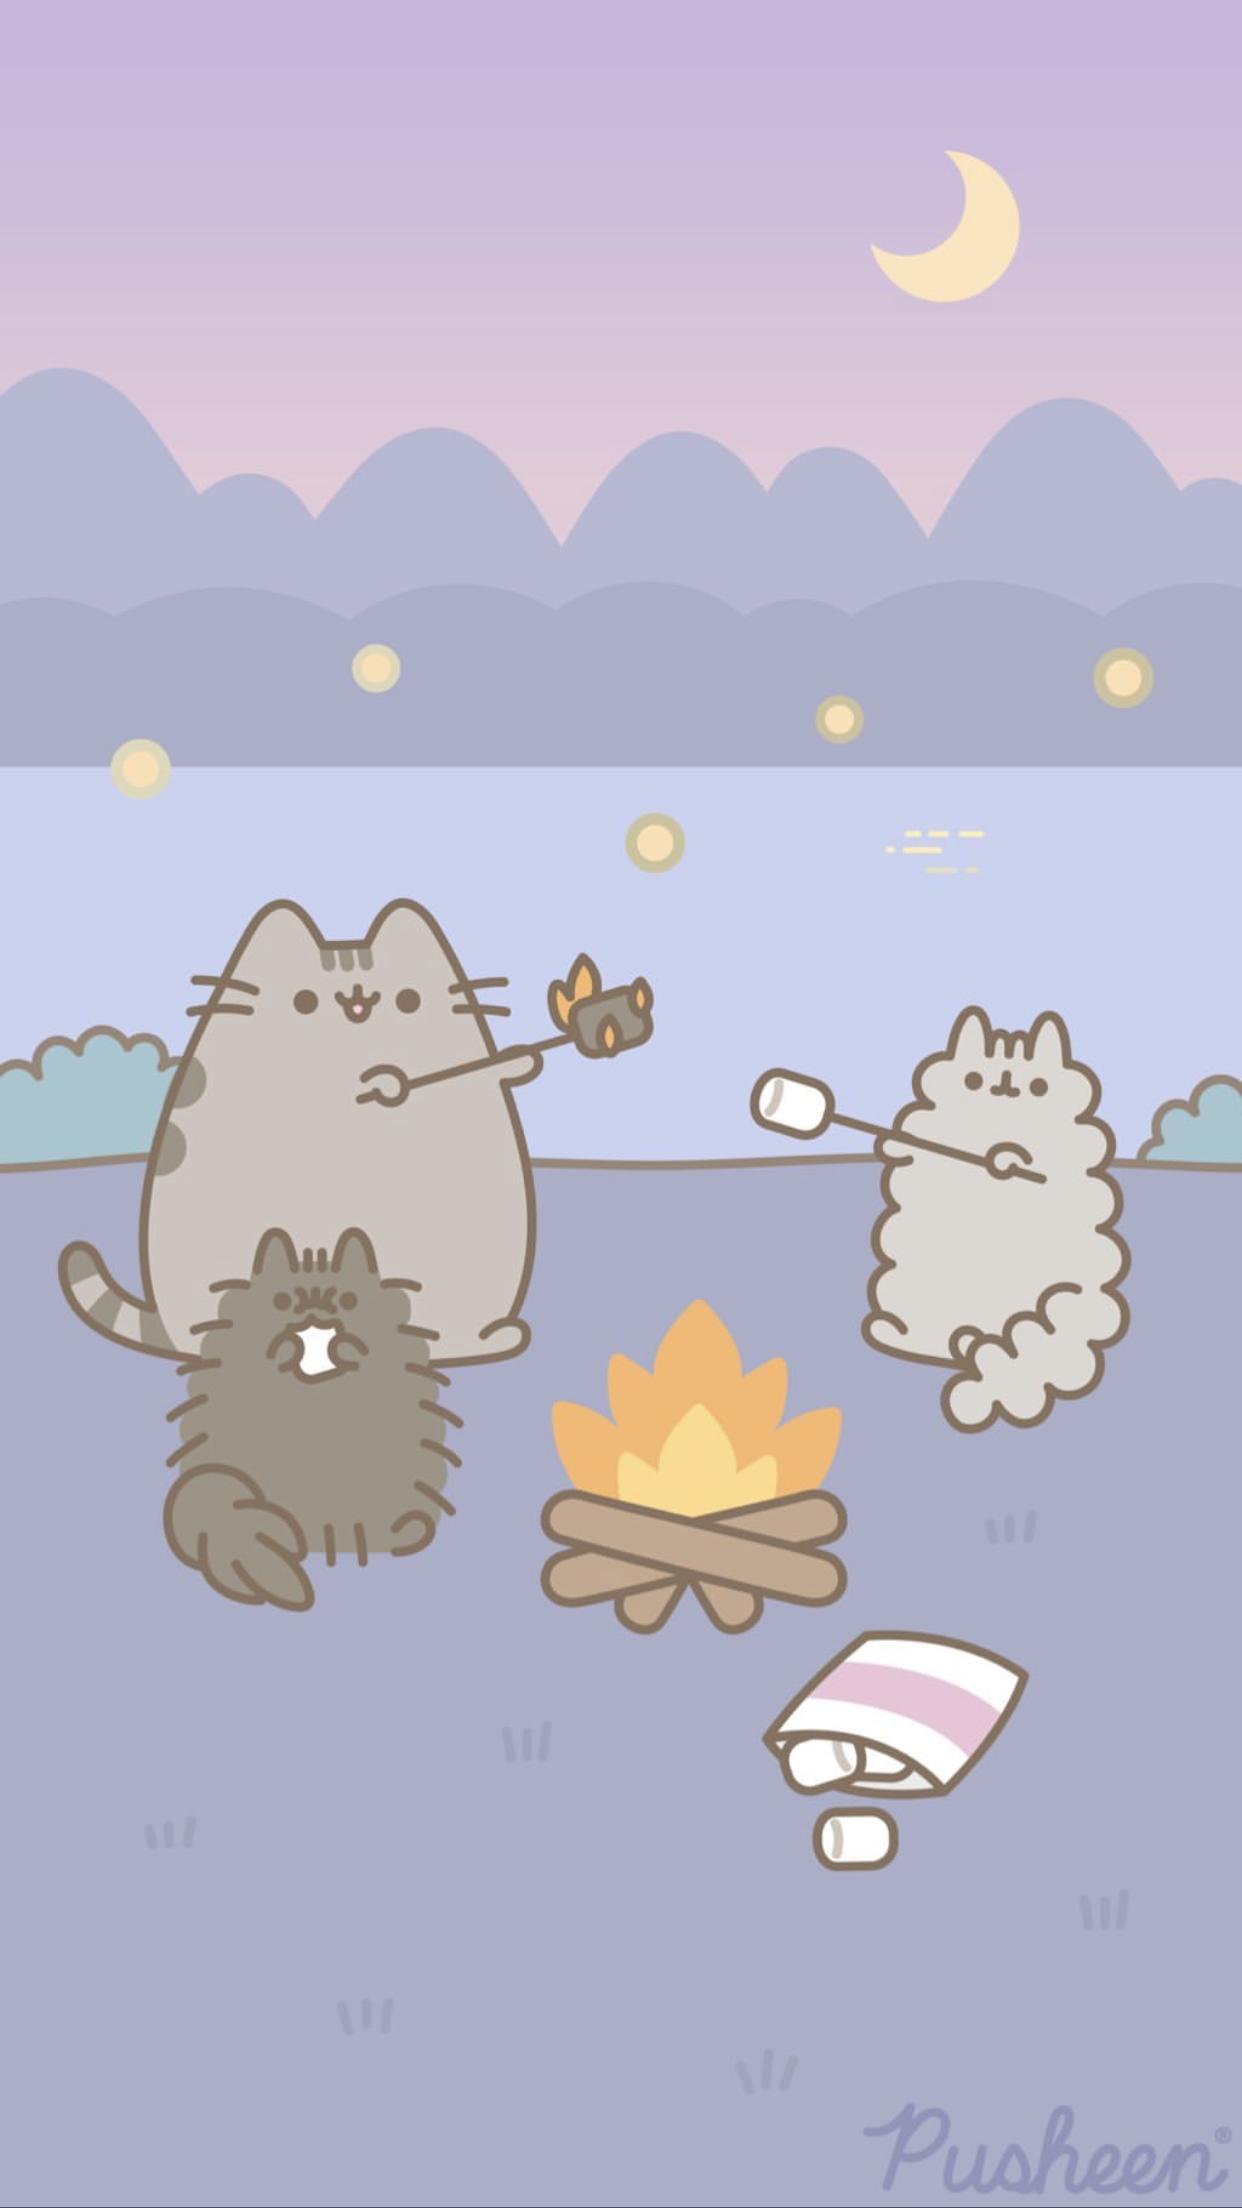 Pusheen The Cat Iphone Wallpaper Camping Summer Pusheen Pusheen Cute Iphone Wallpaper Cat